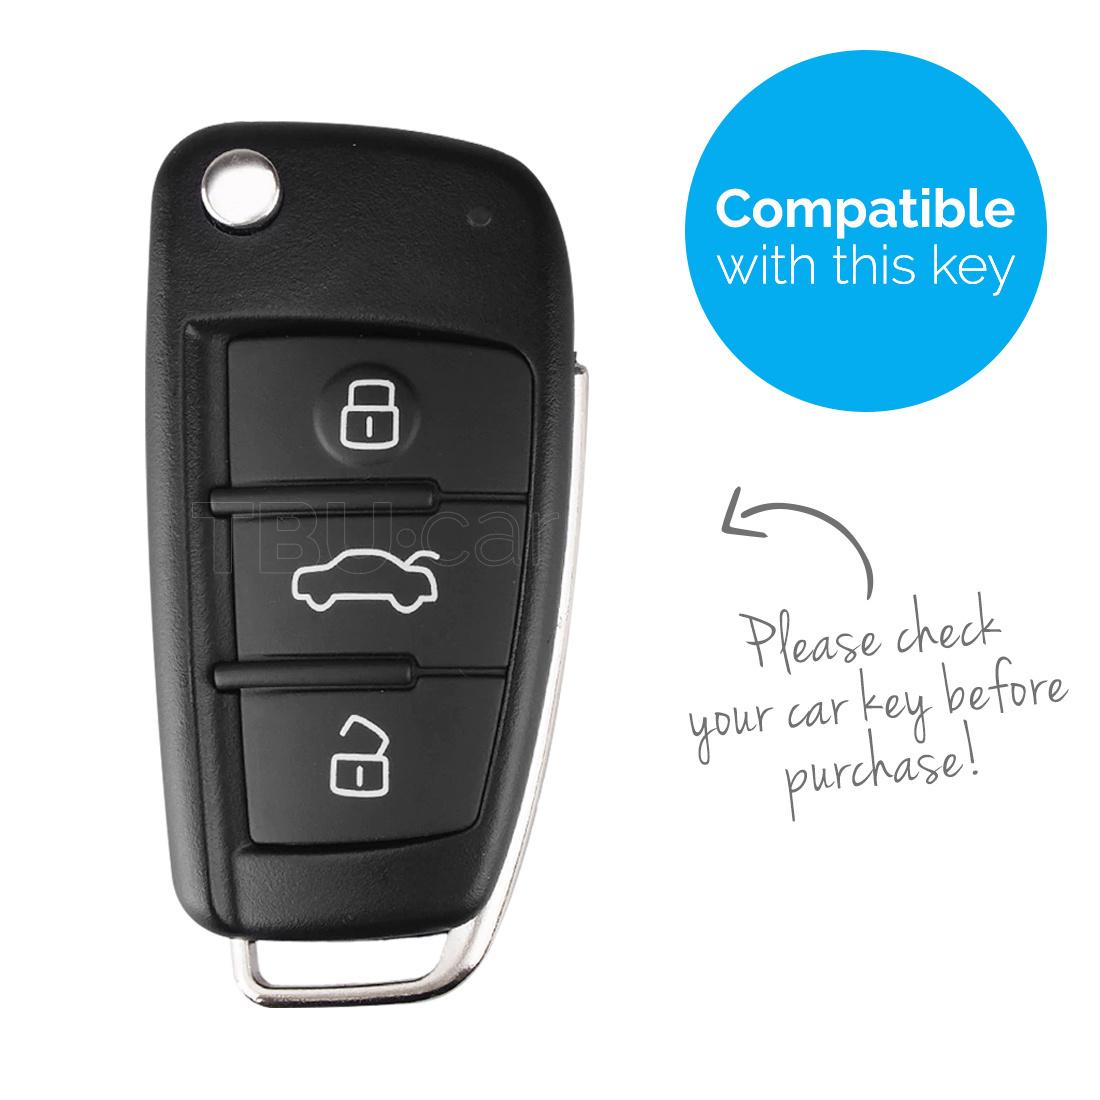 TBU car TBU car Car key cover compatible with Audi - TPU Protective Remote Key Shell - FOB Case Cover - Gold